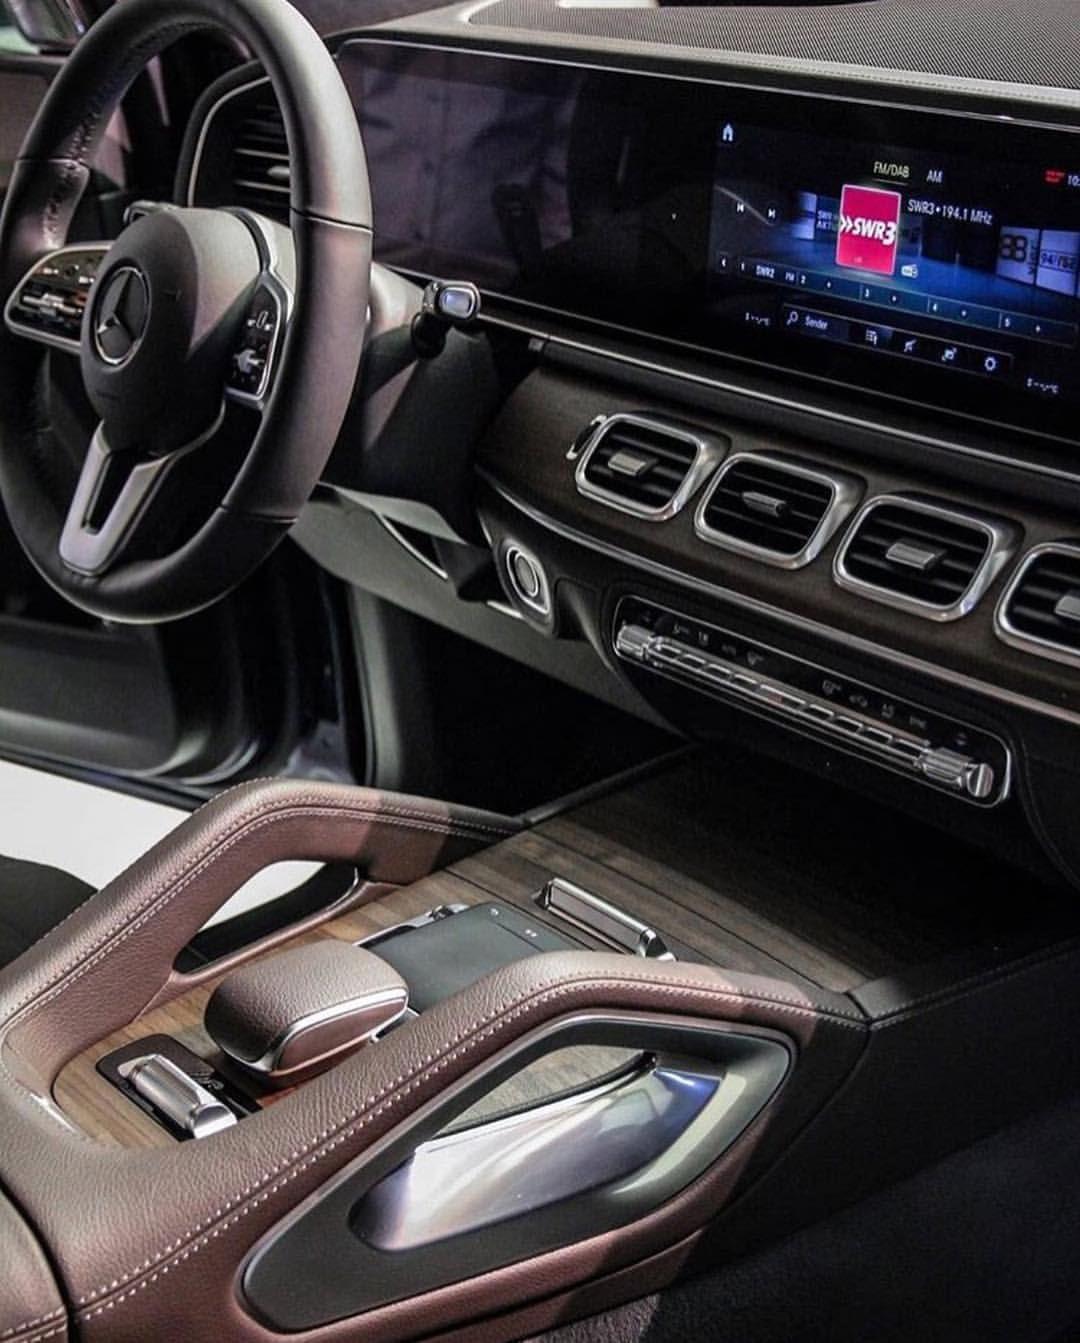 New Mercedes GLE ️😈 #mercedesbenz #gle #dubai #benz